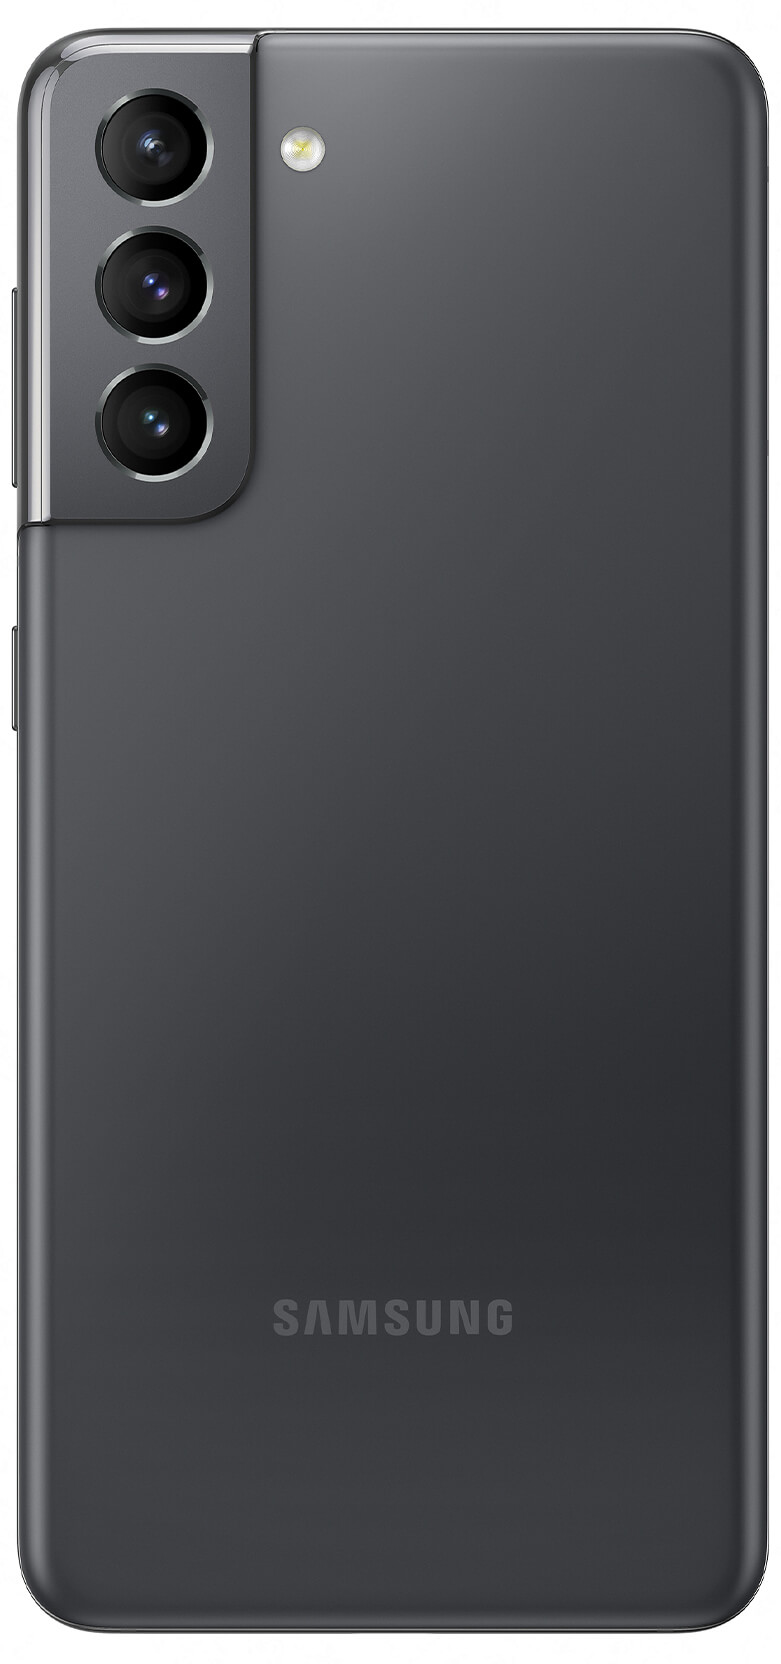 Samsung Galaxy S21 Plus 5G Phantom Black 8GB RAM |256GB